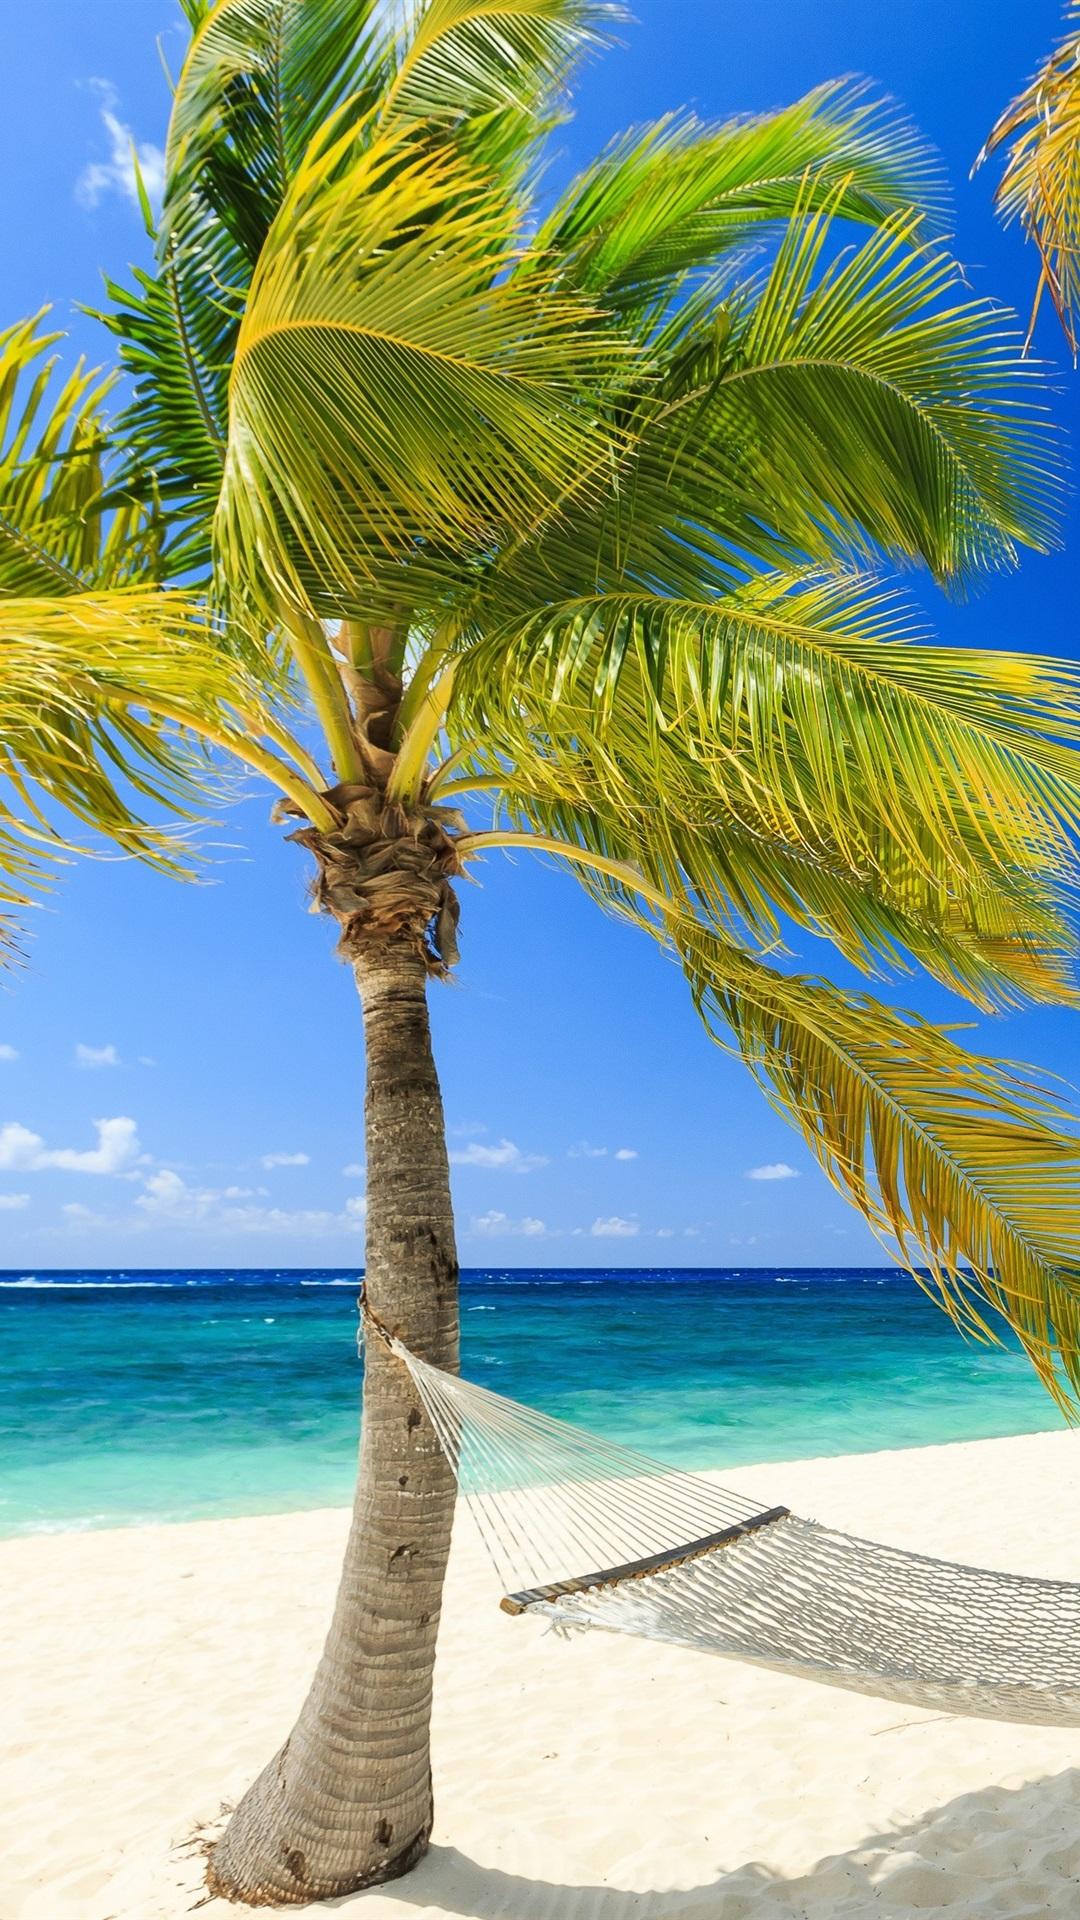 Tropical Paradise Sea Beach Palm Trees Hammock Summer